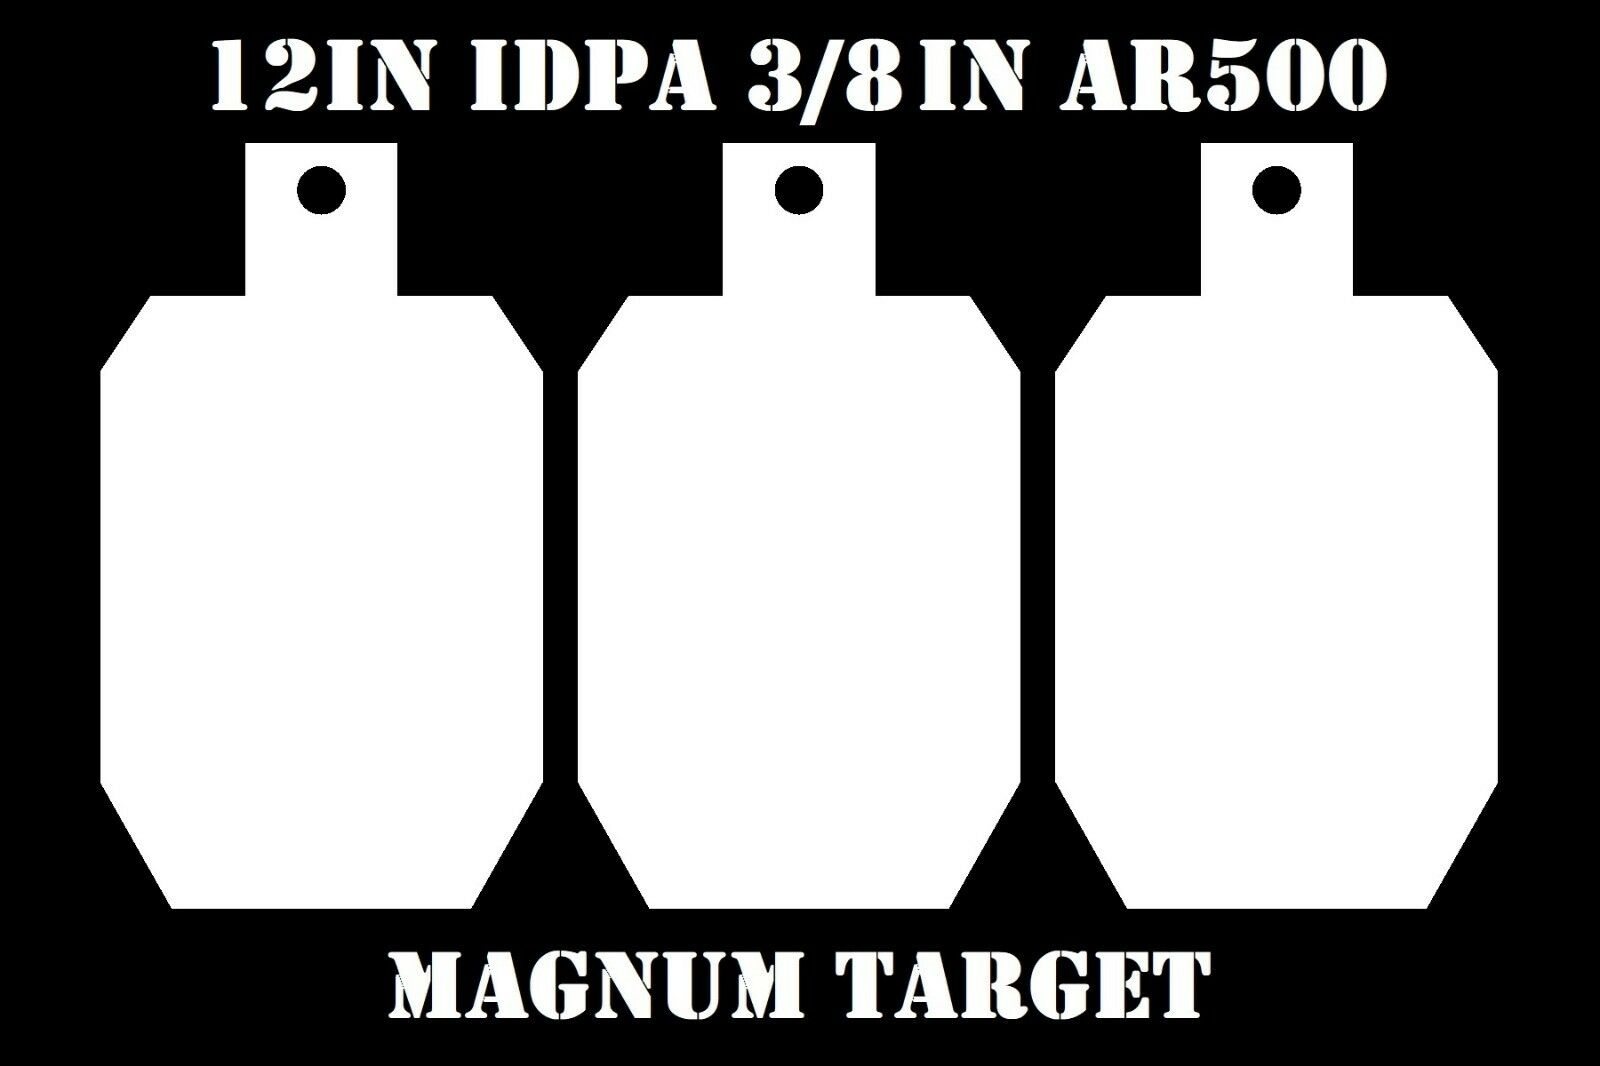 12in.Tall IDPA ISPC Steel Targets - 3 8in. AR500 Targets - 3pc. Metal Gong Set